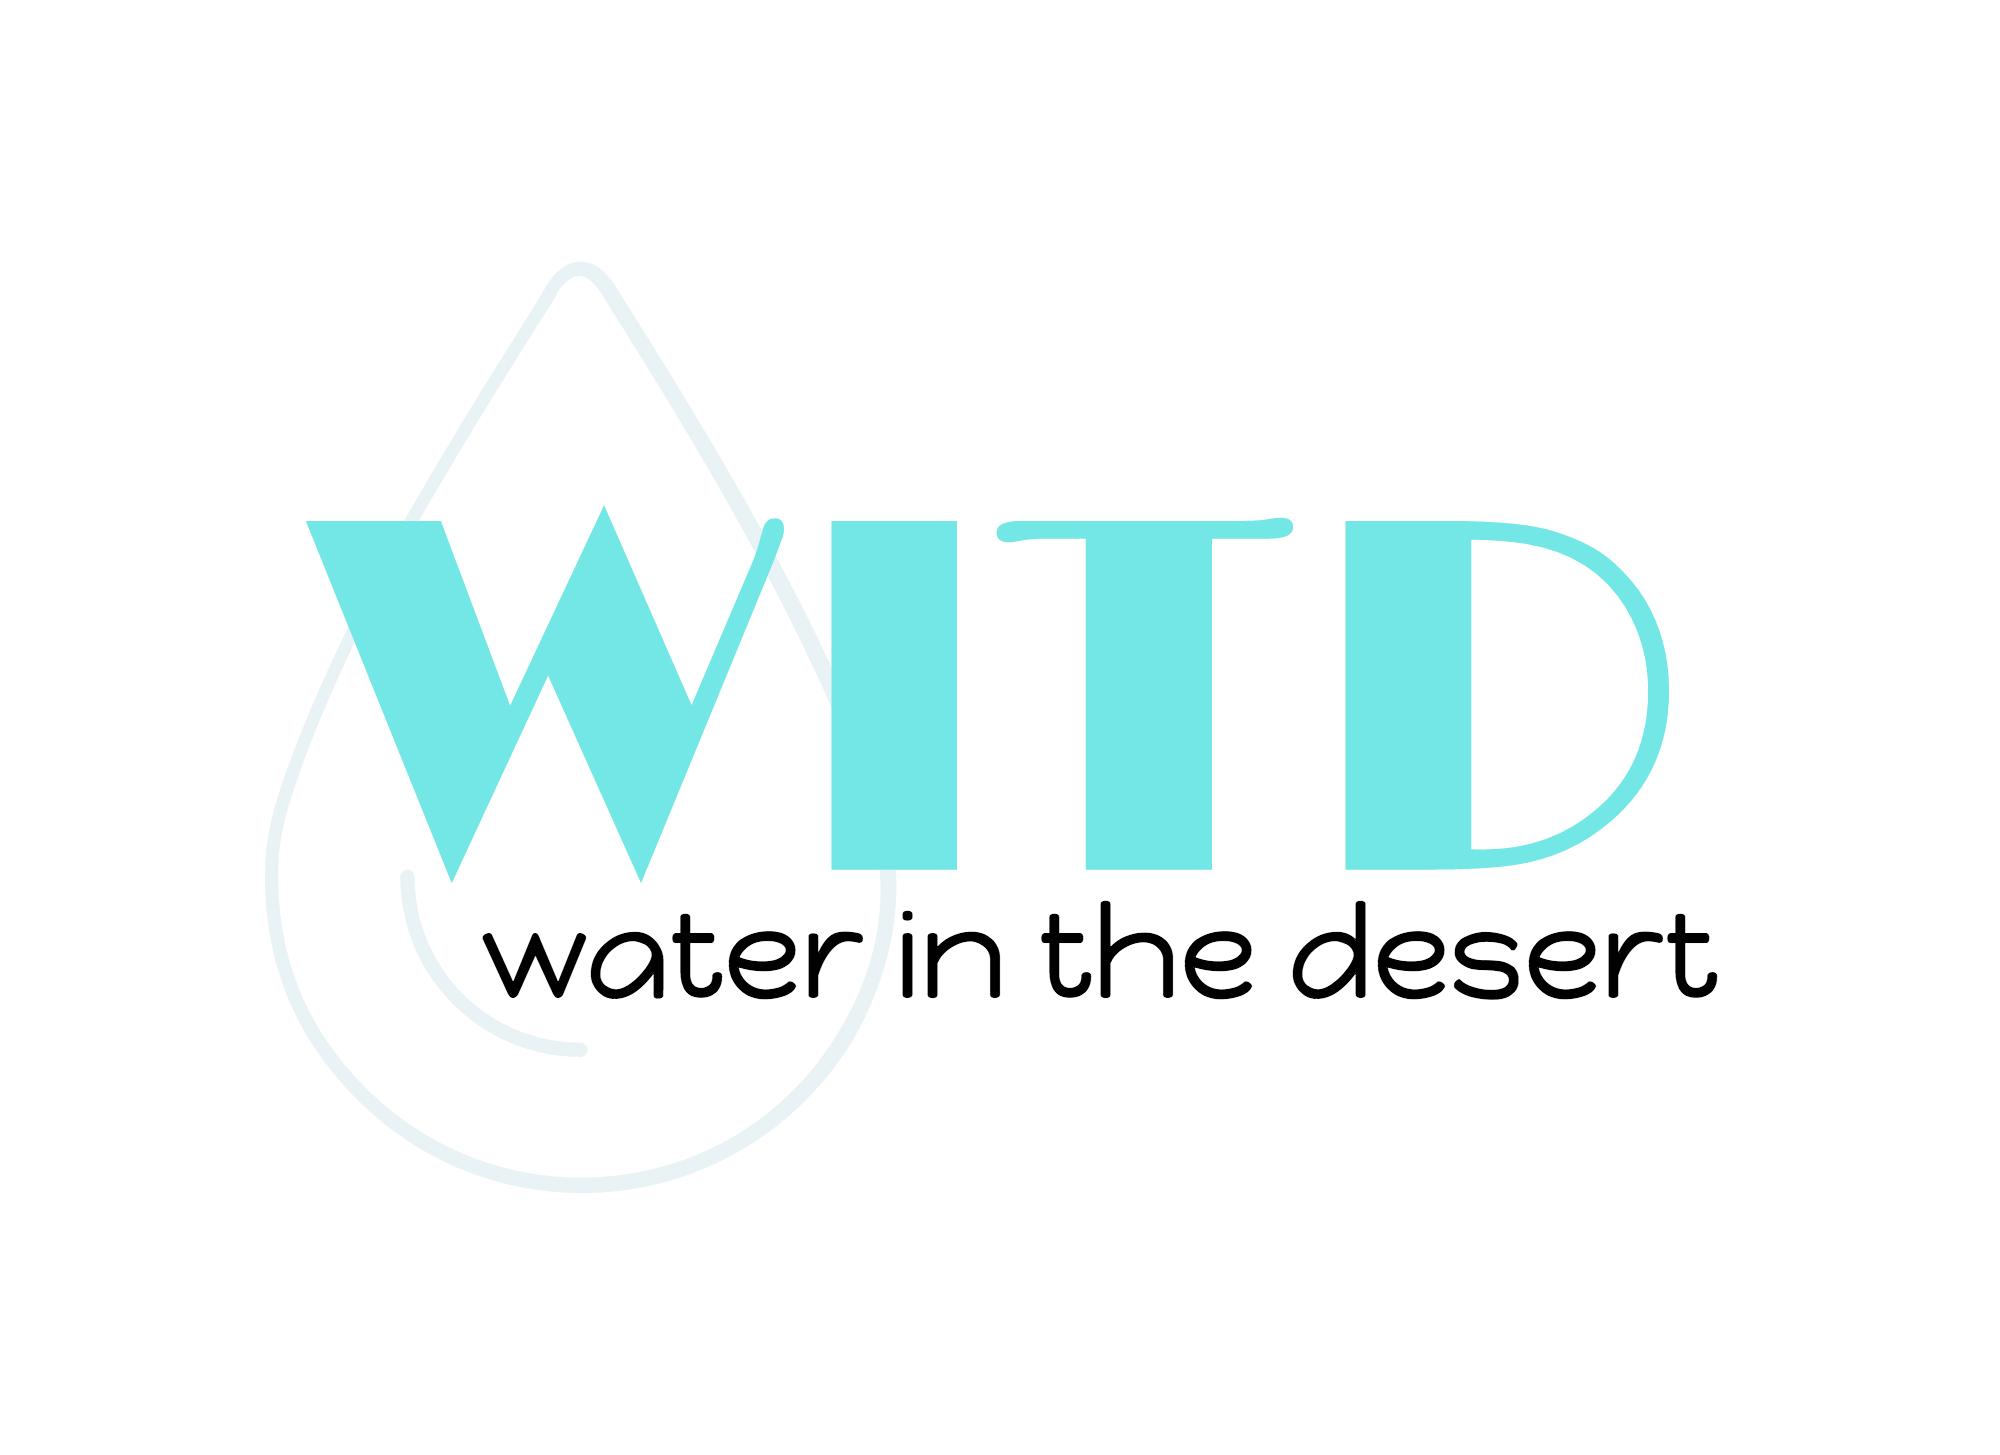 WITD-logo.png